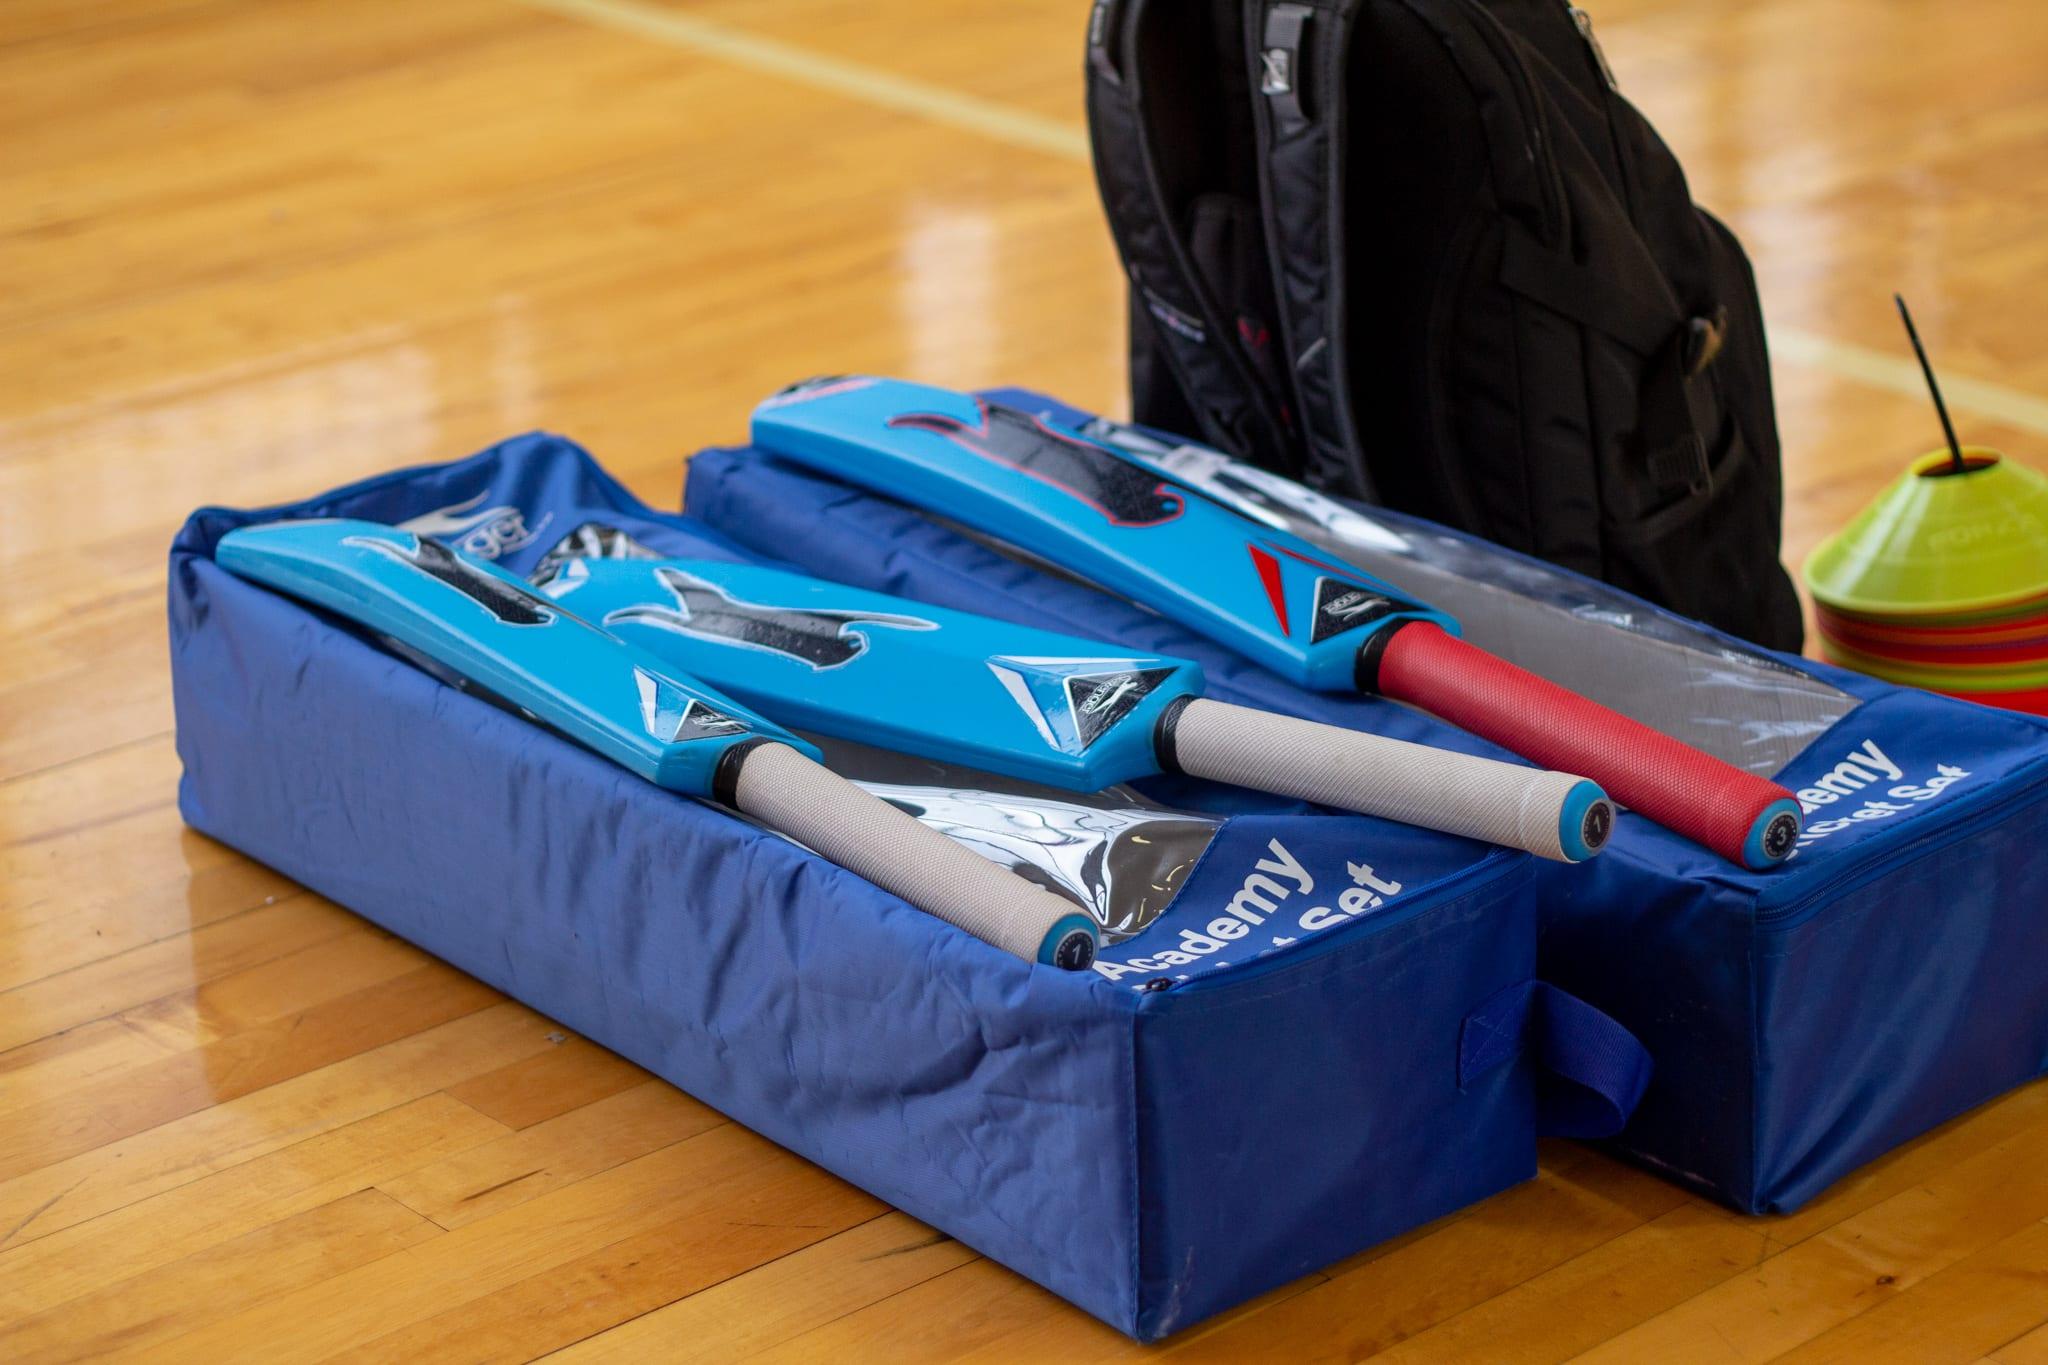 blue cricket bats on bags